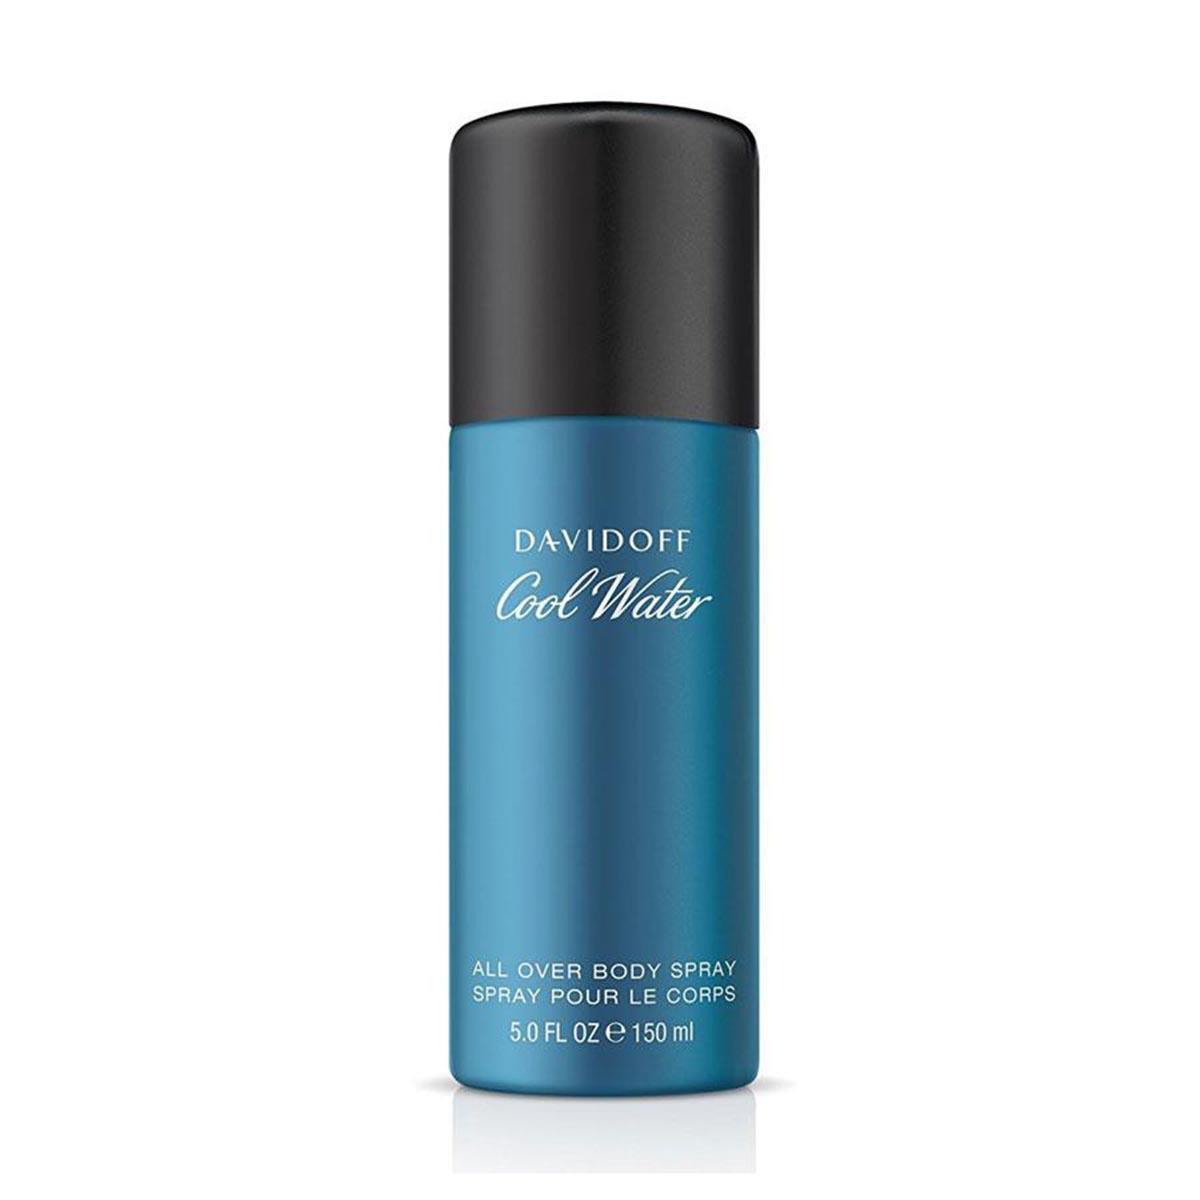 Desodorizante Spray Cool Water All Over Body Spray Davidoff 150ml